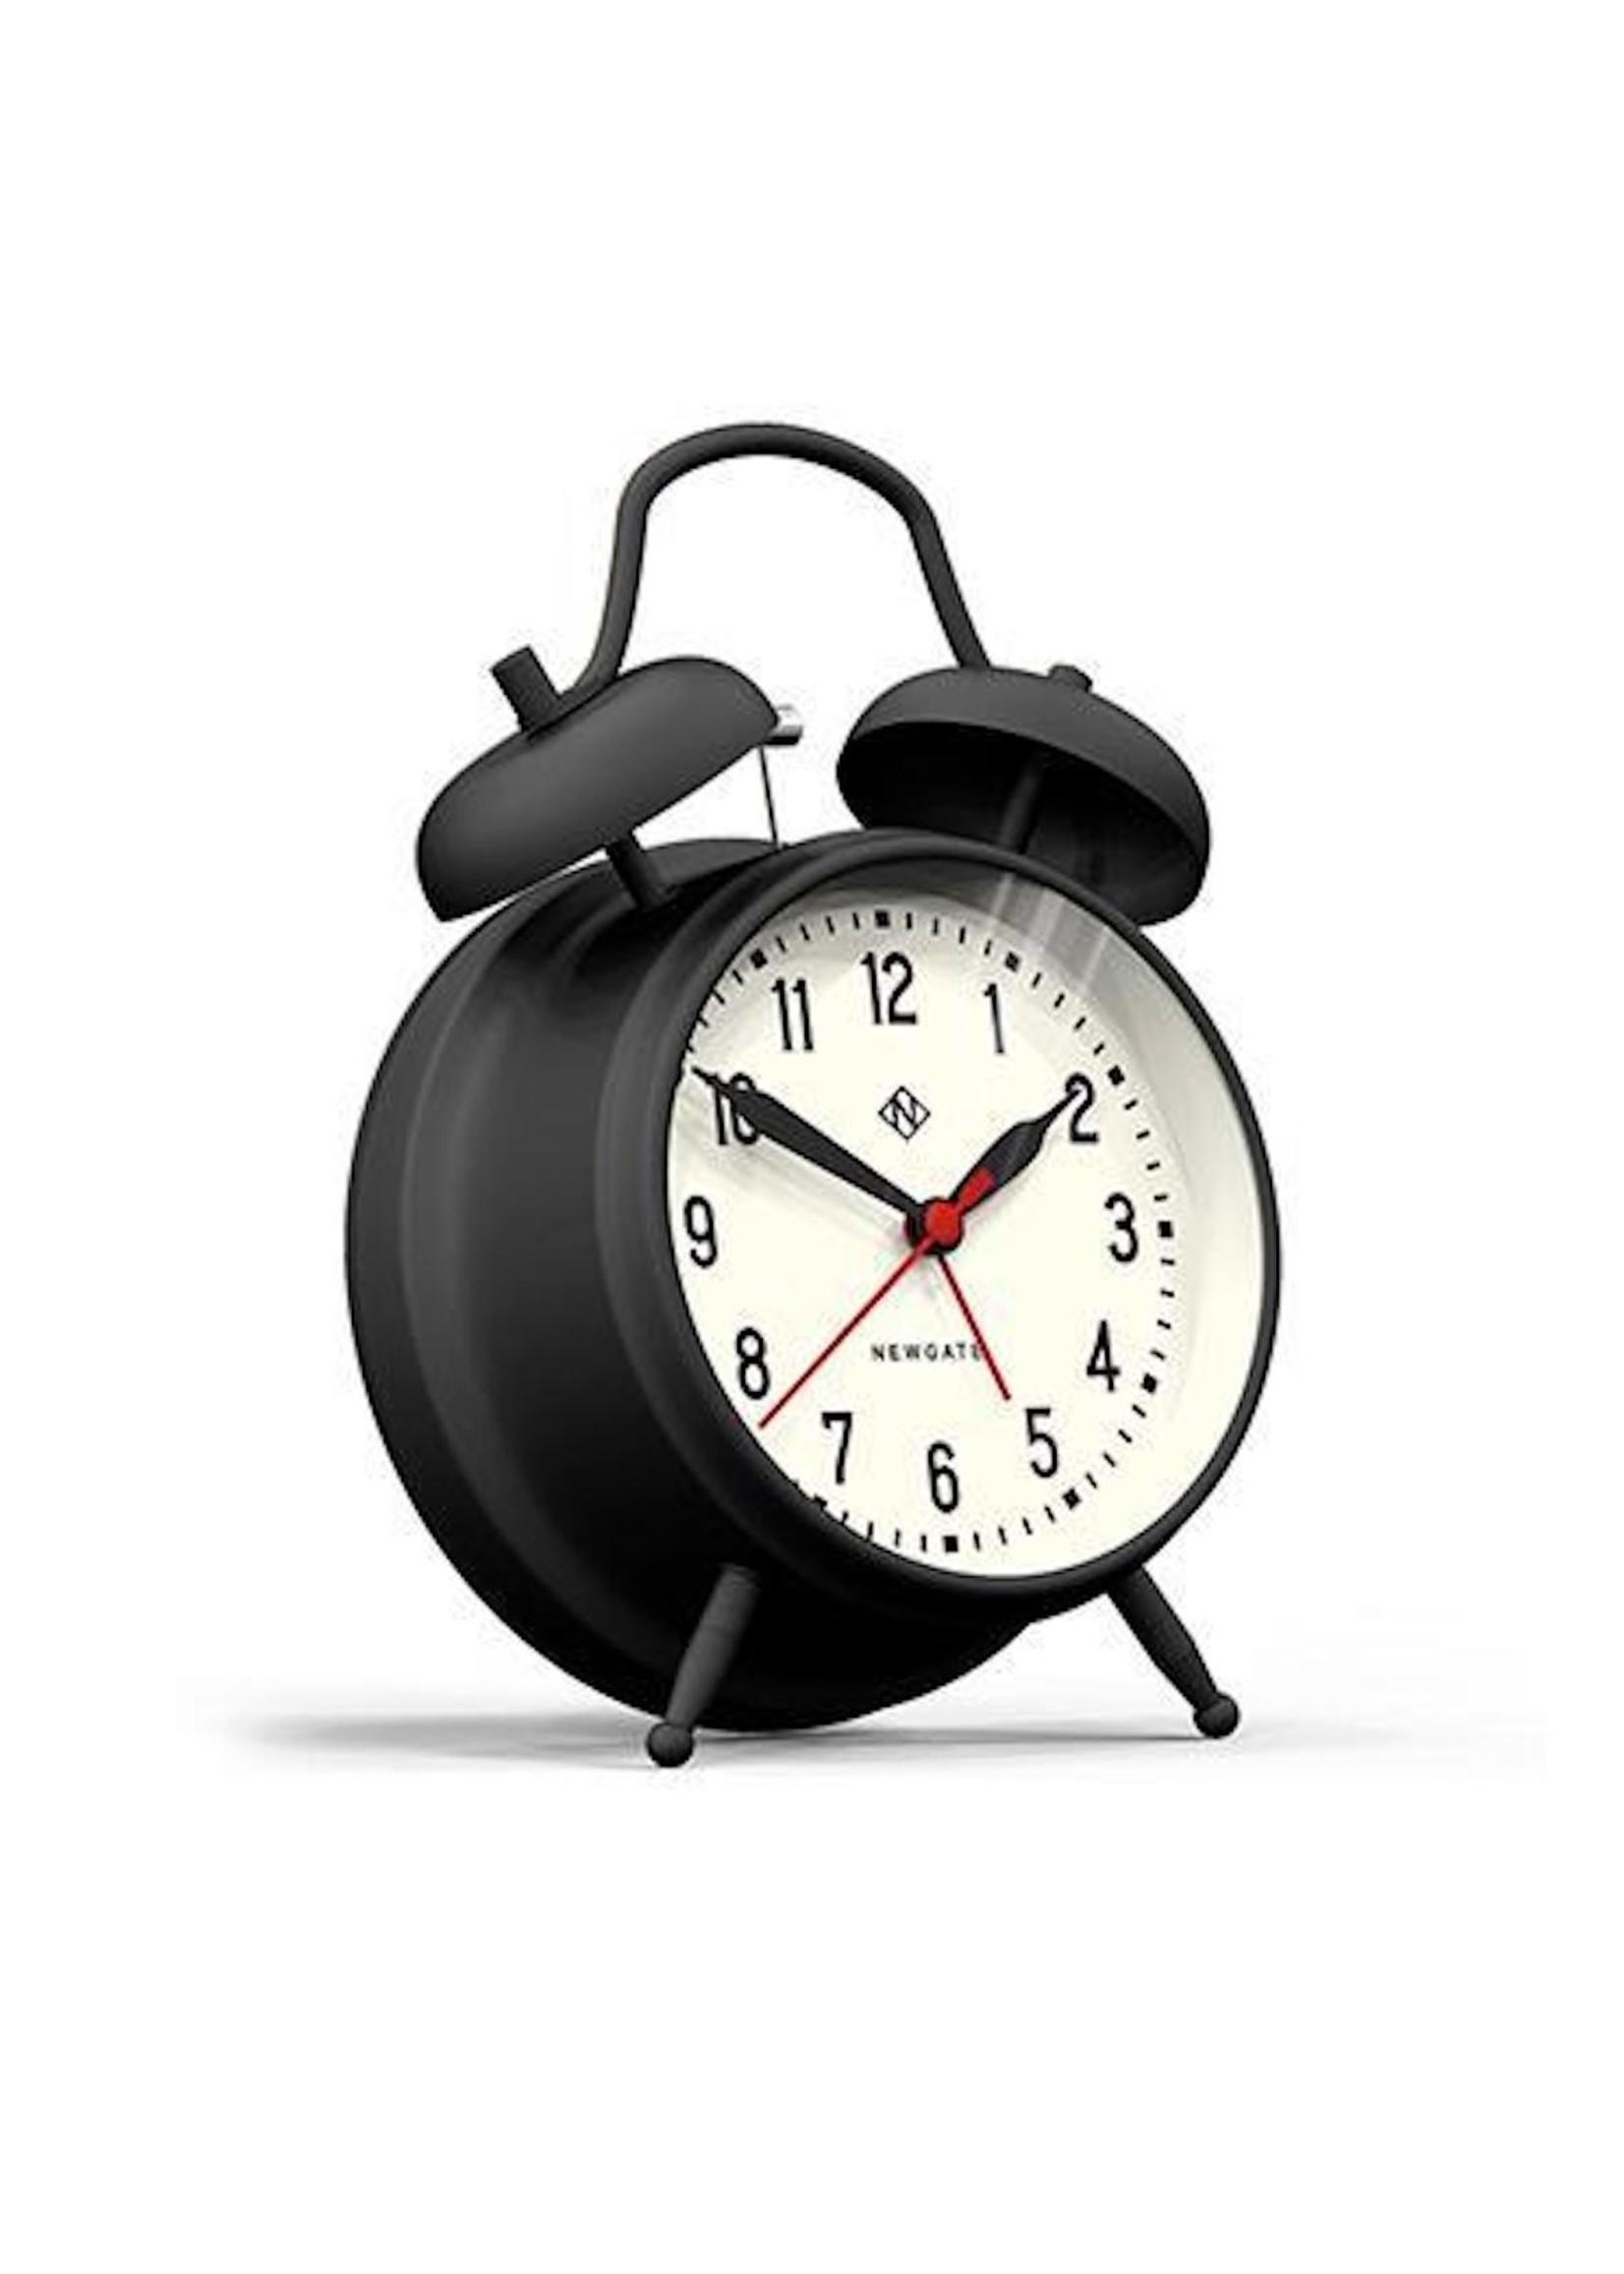 Newgate Newgate Manchester Alarm Clock